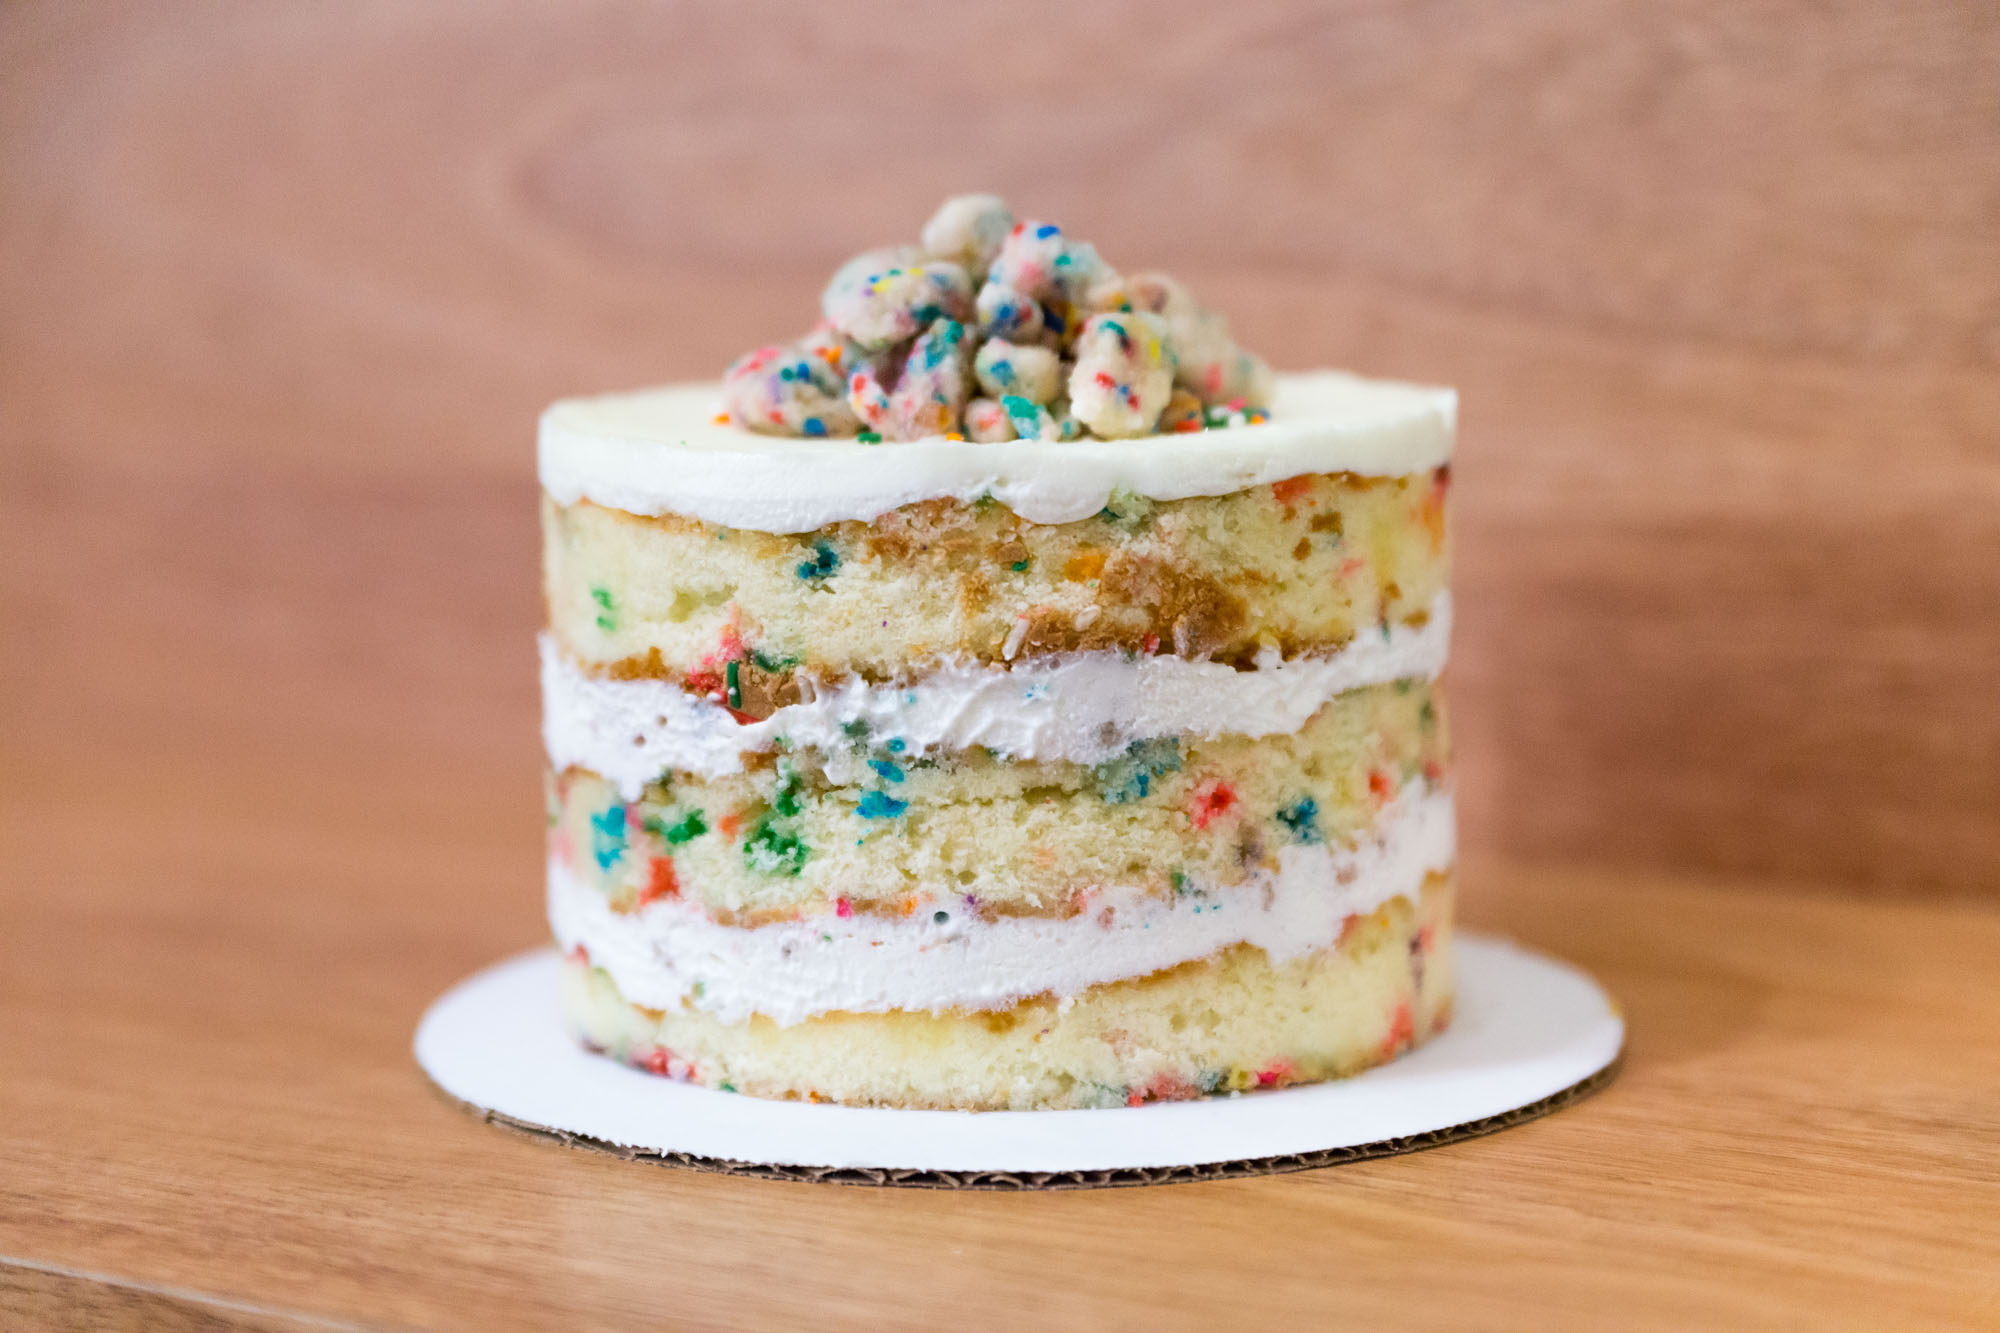 Carlos Bake Shop Eater Vegas